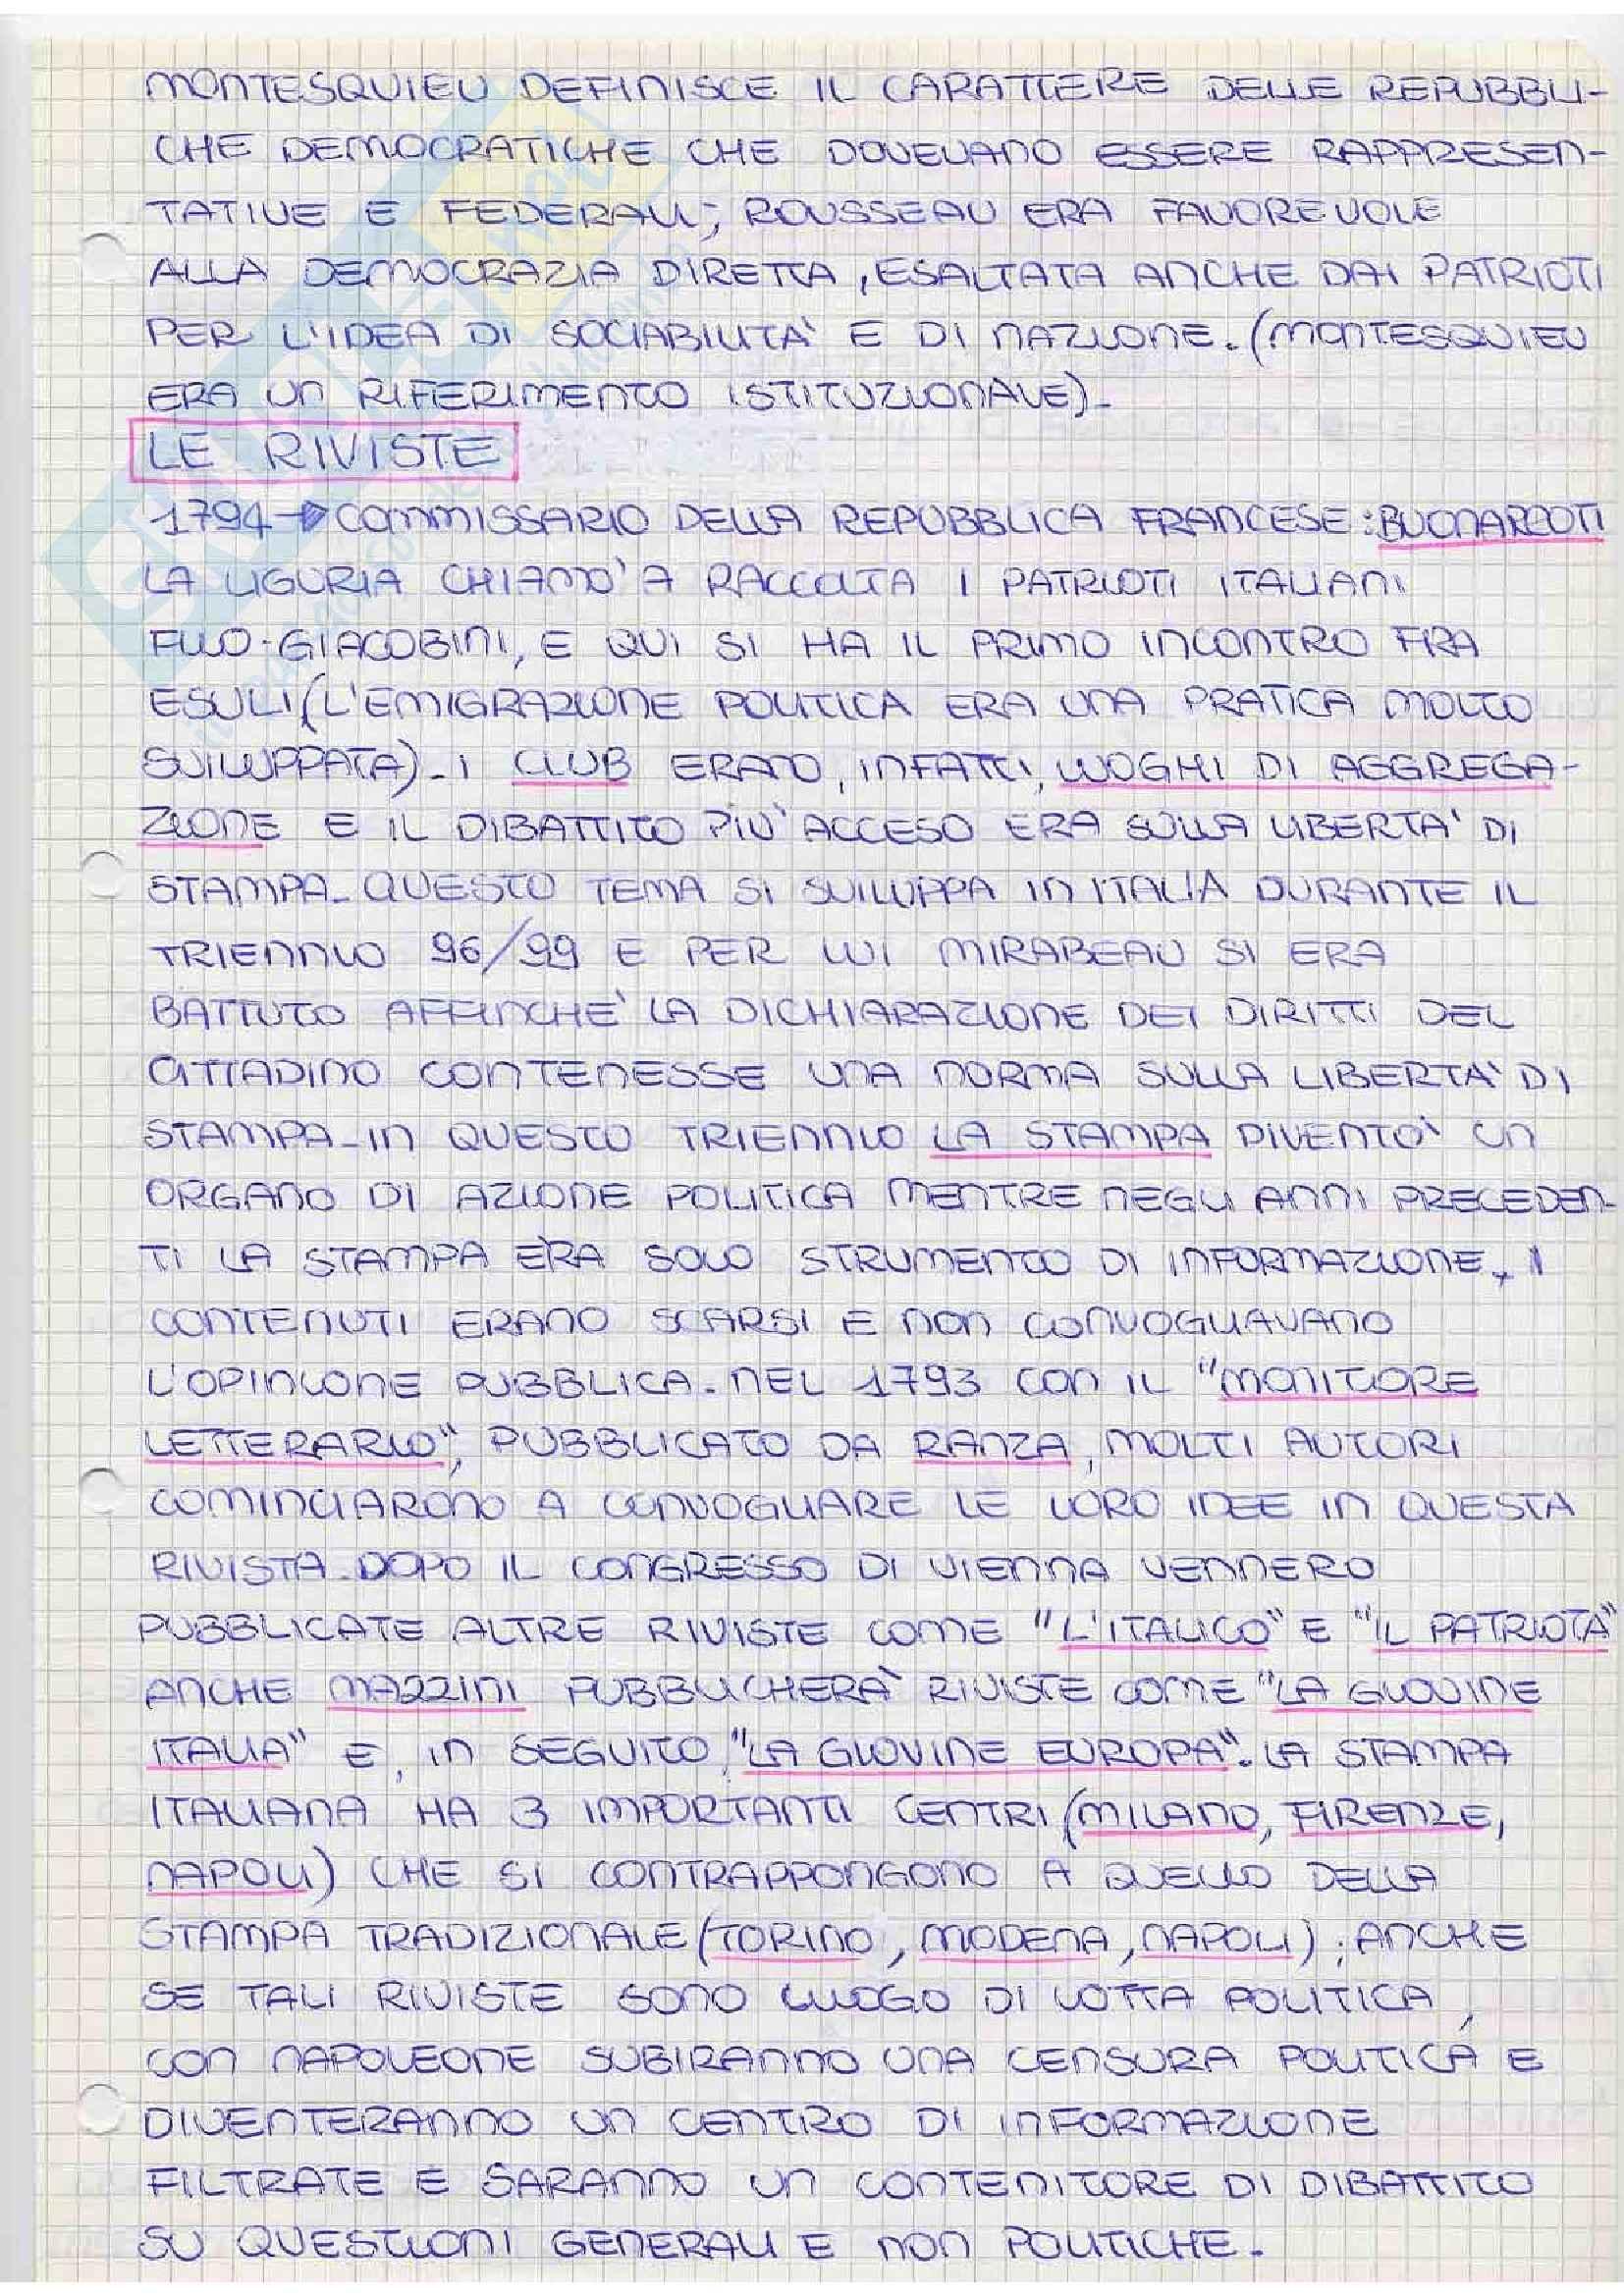 Storia del pensiero politico - Buonarroti